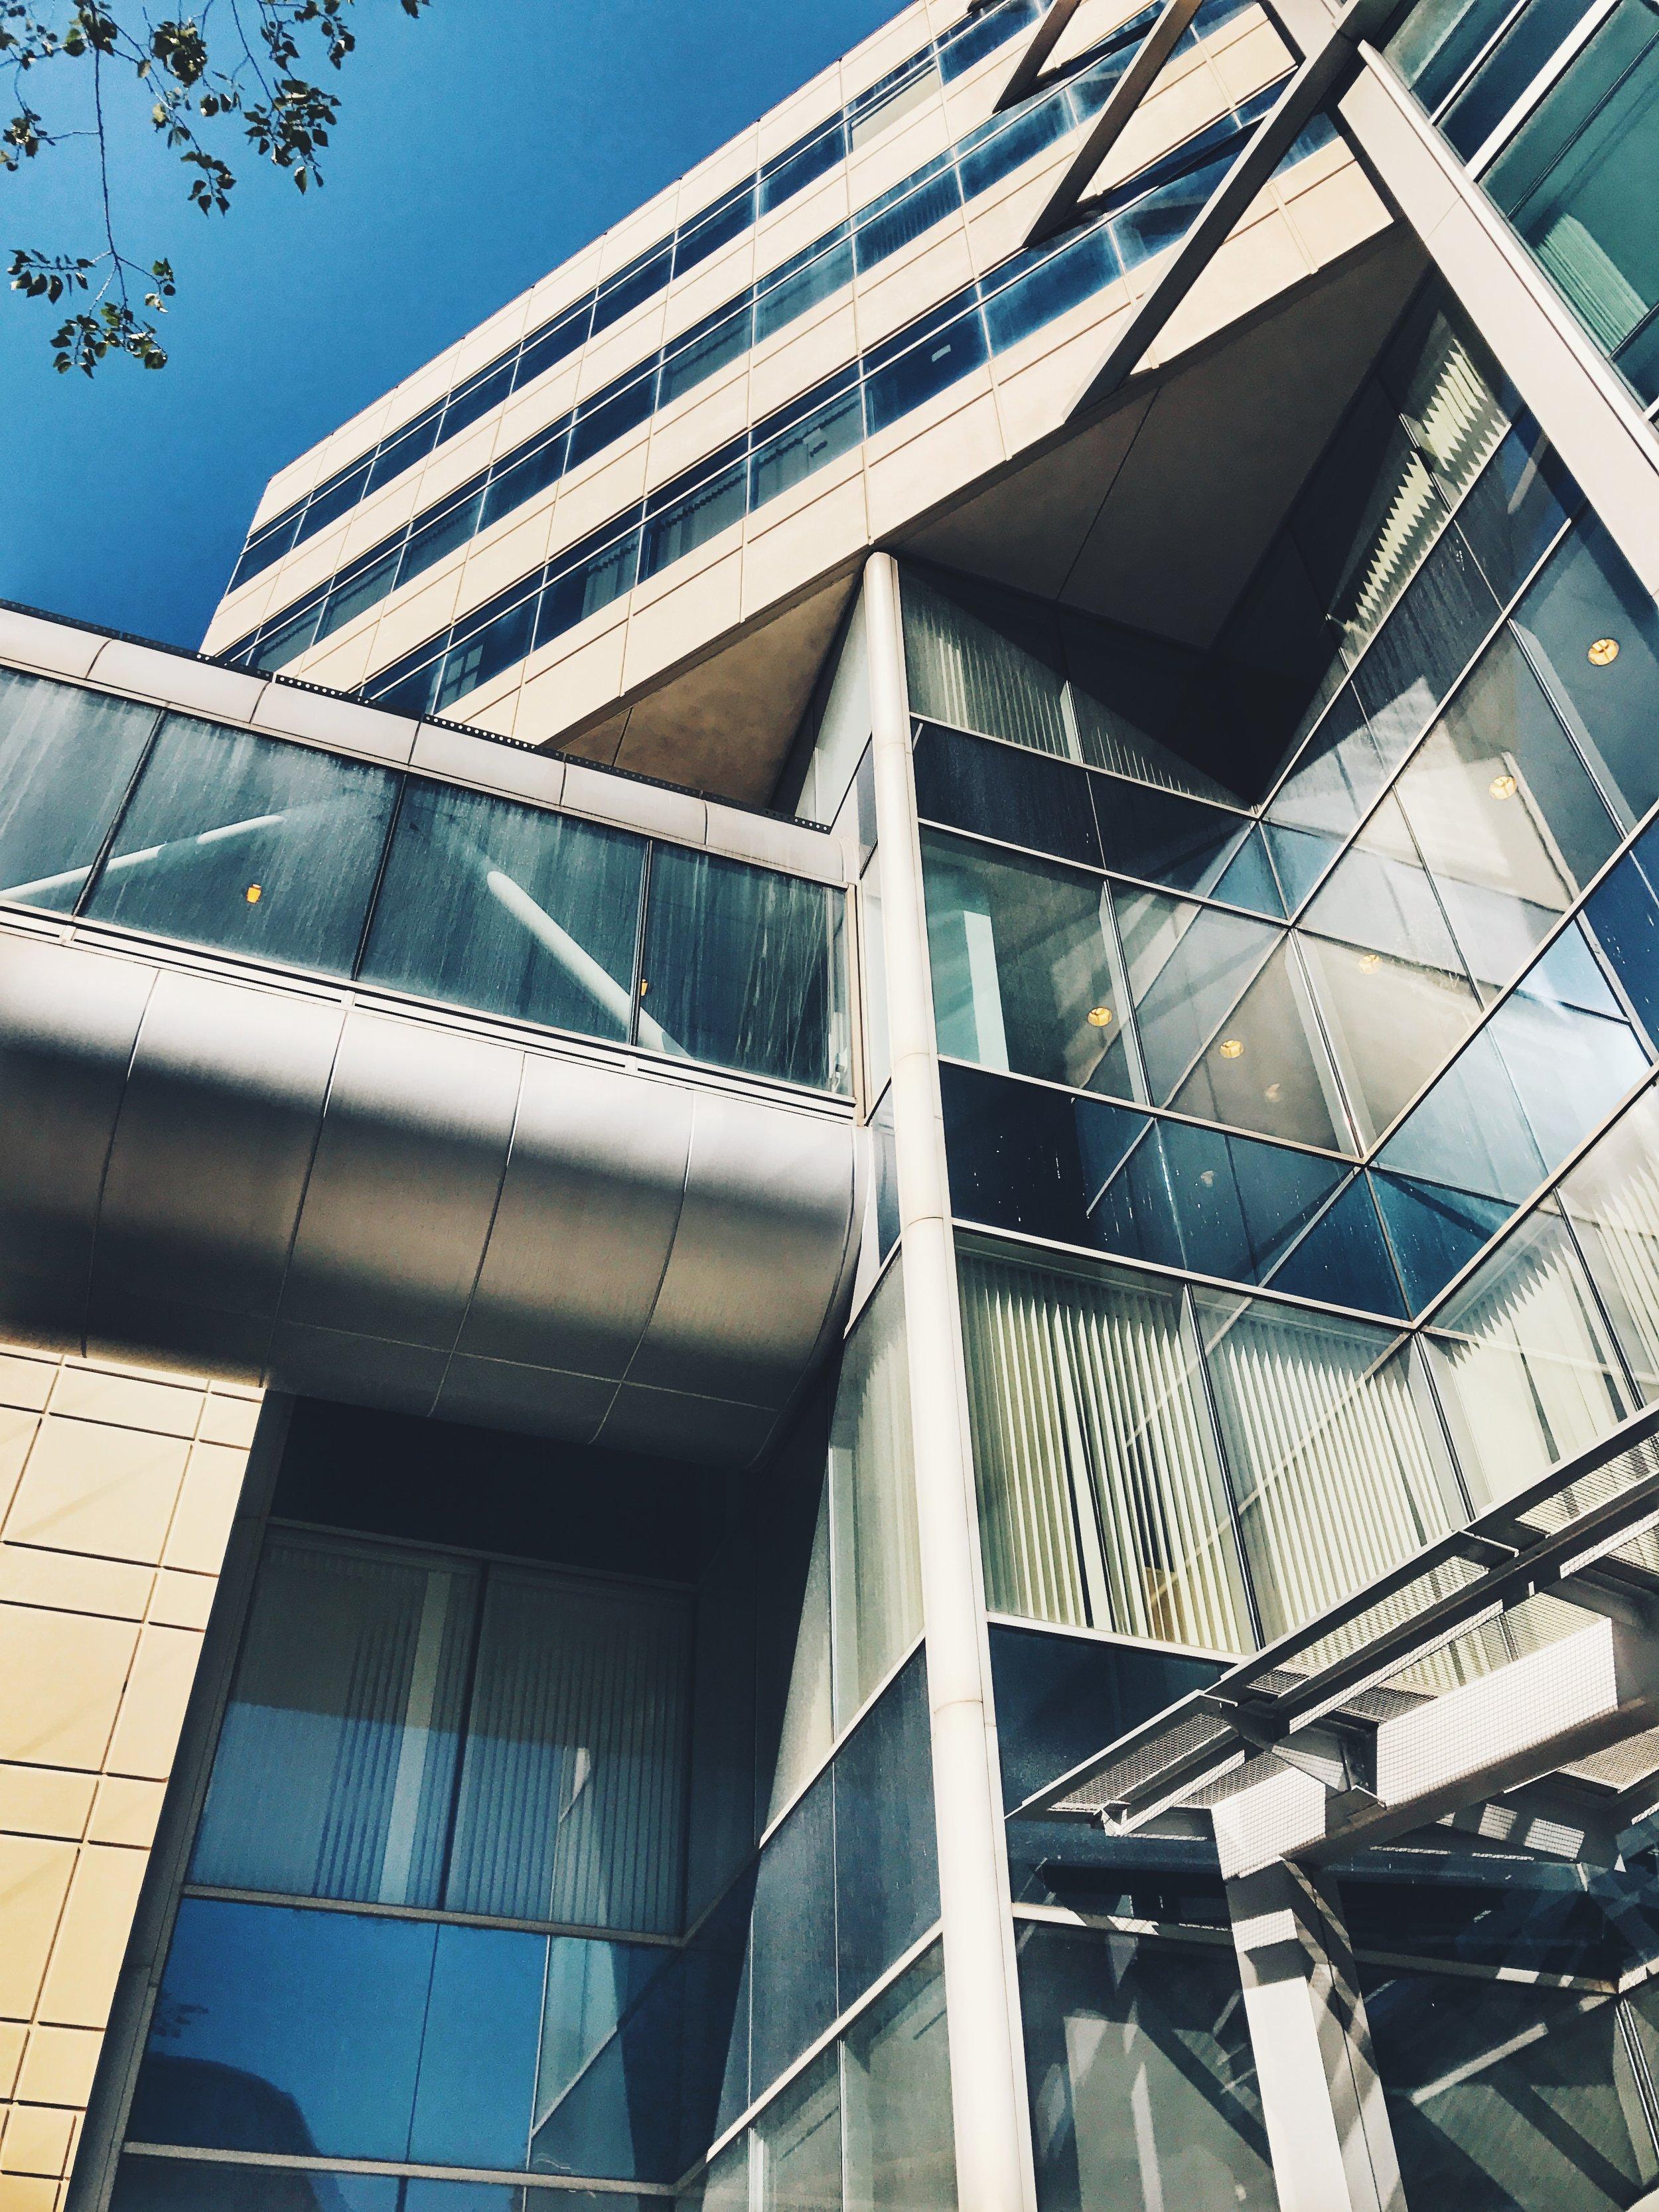 Architecture03-sample.JPG